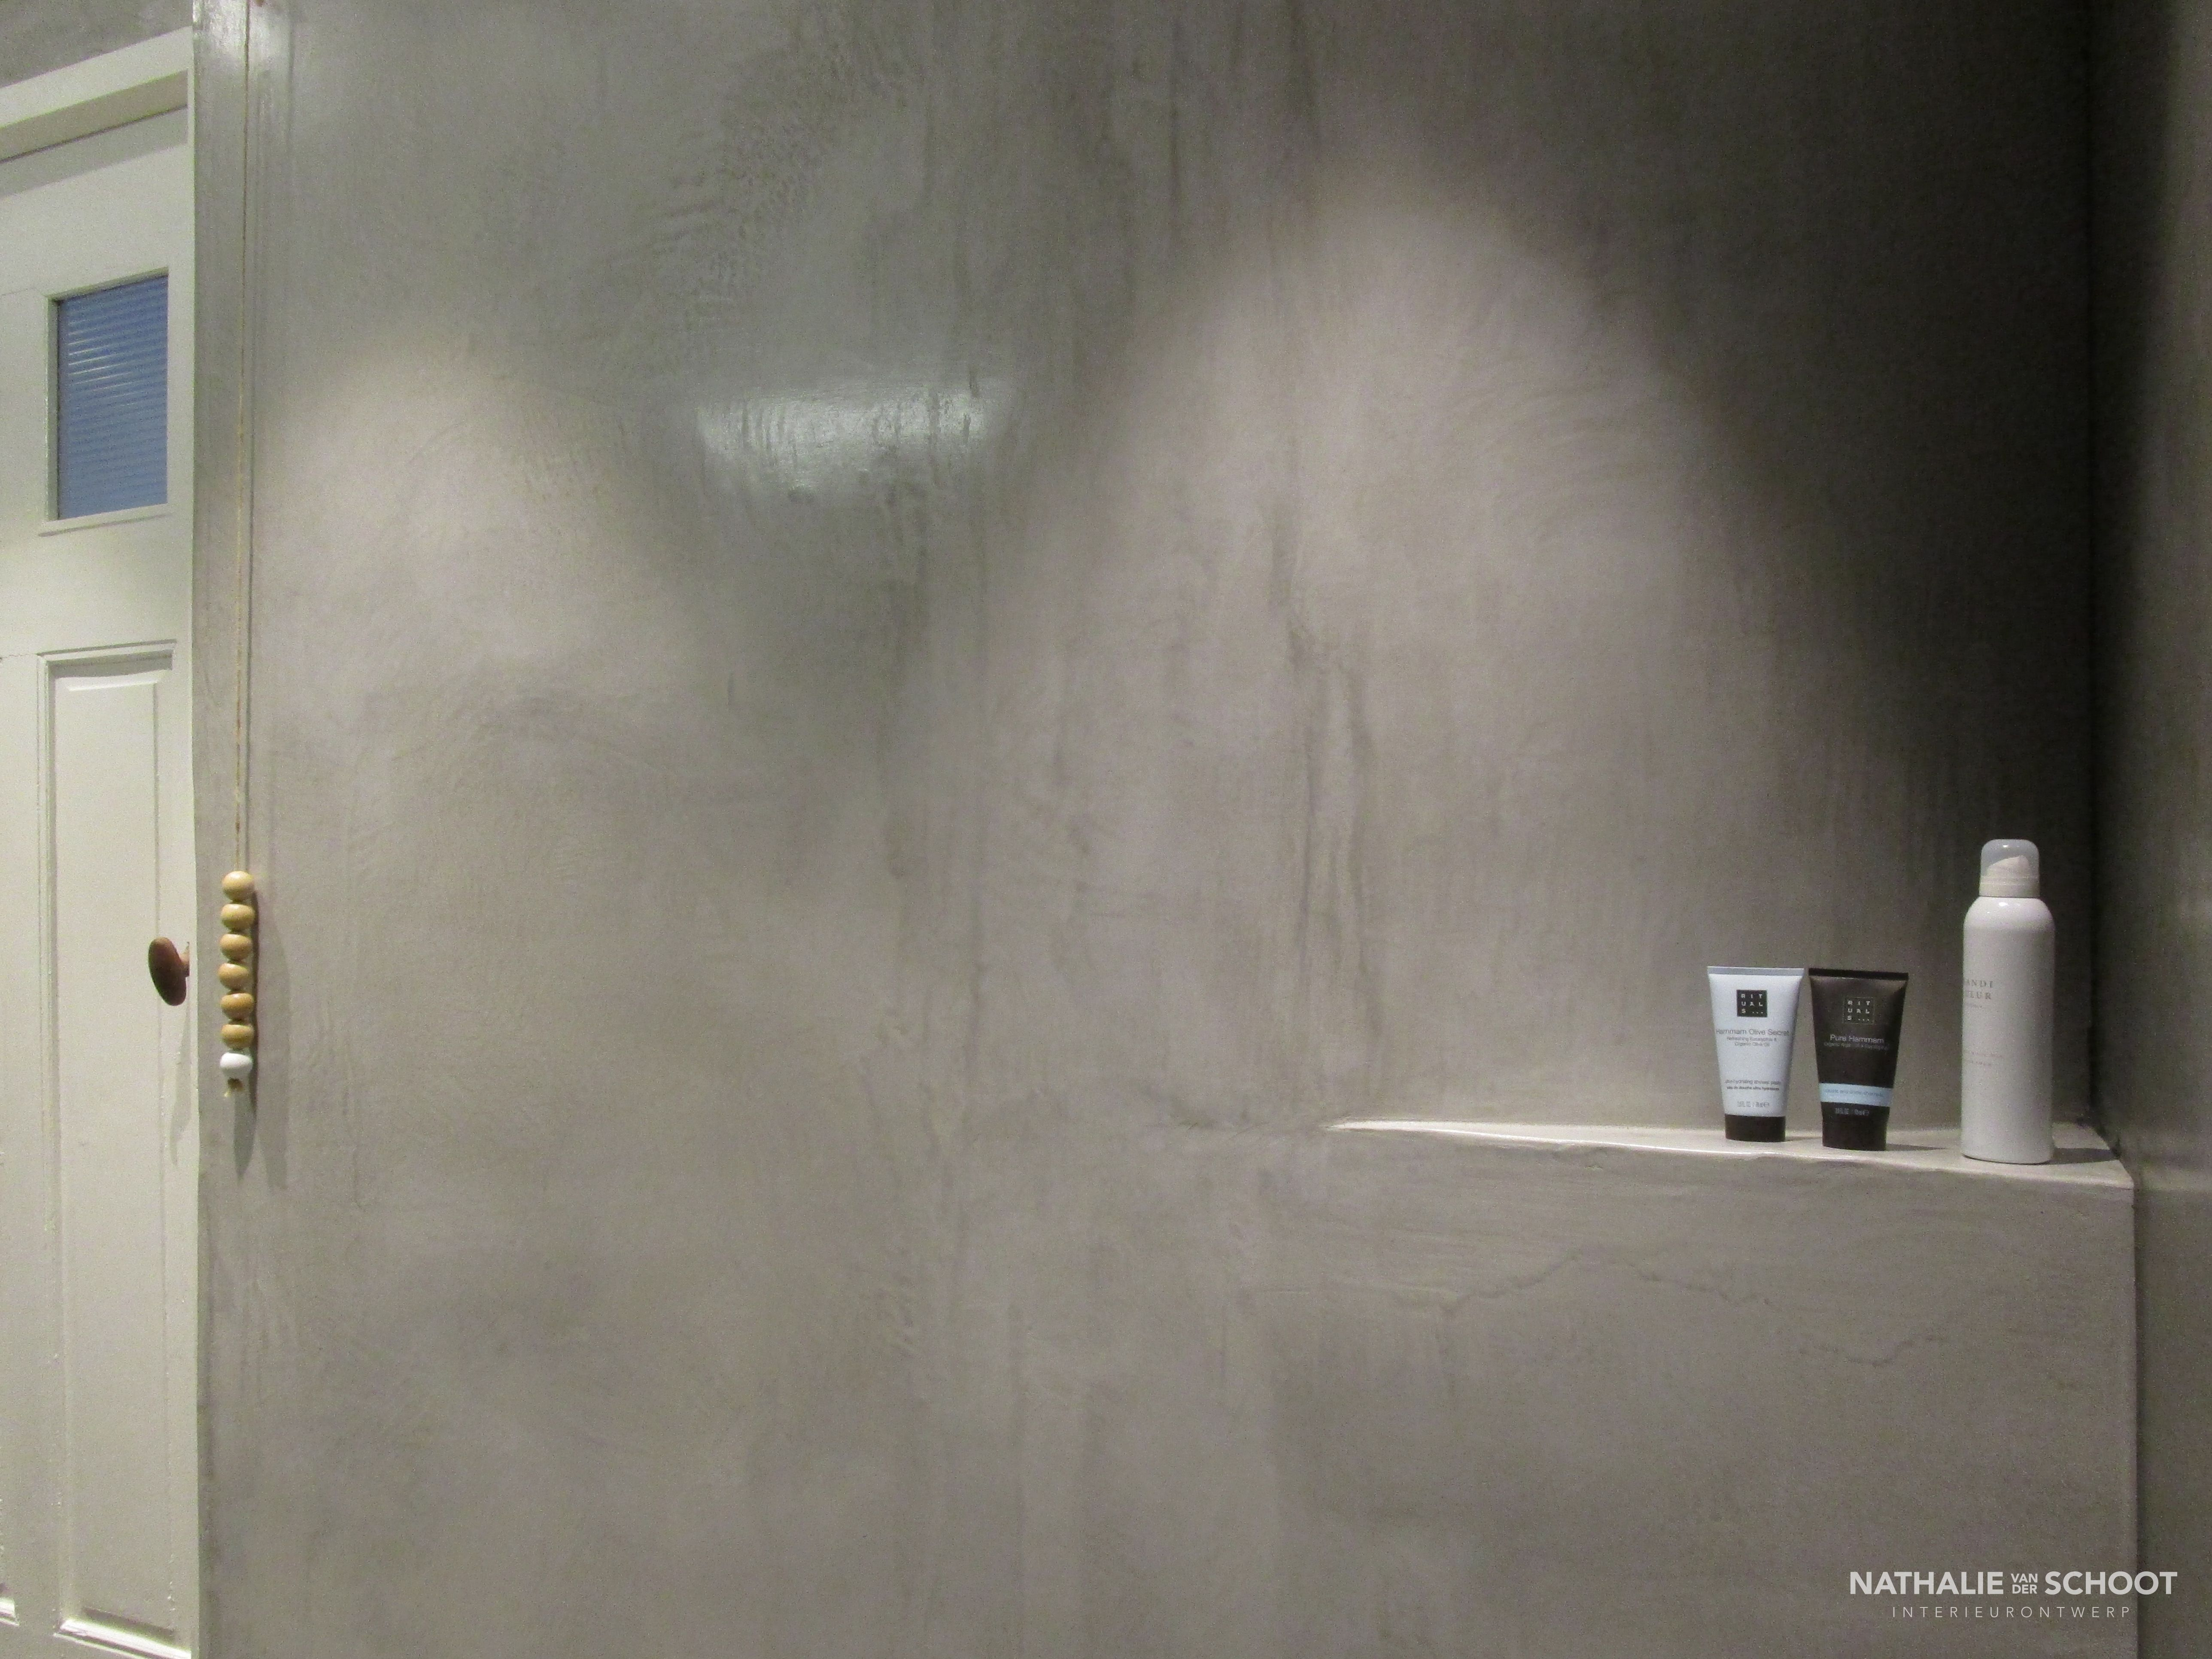 Badkamer in VERBAU-betonstuc. Kleuren #01/128 steenkool en #05 ...